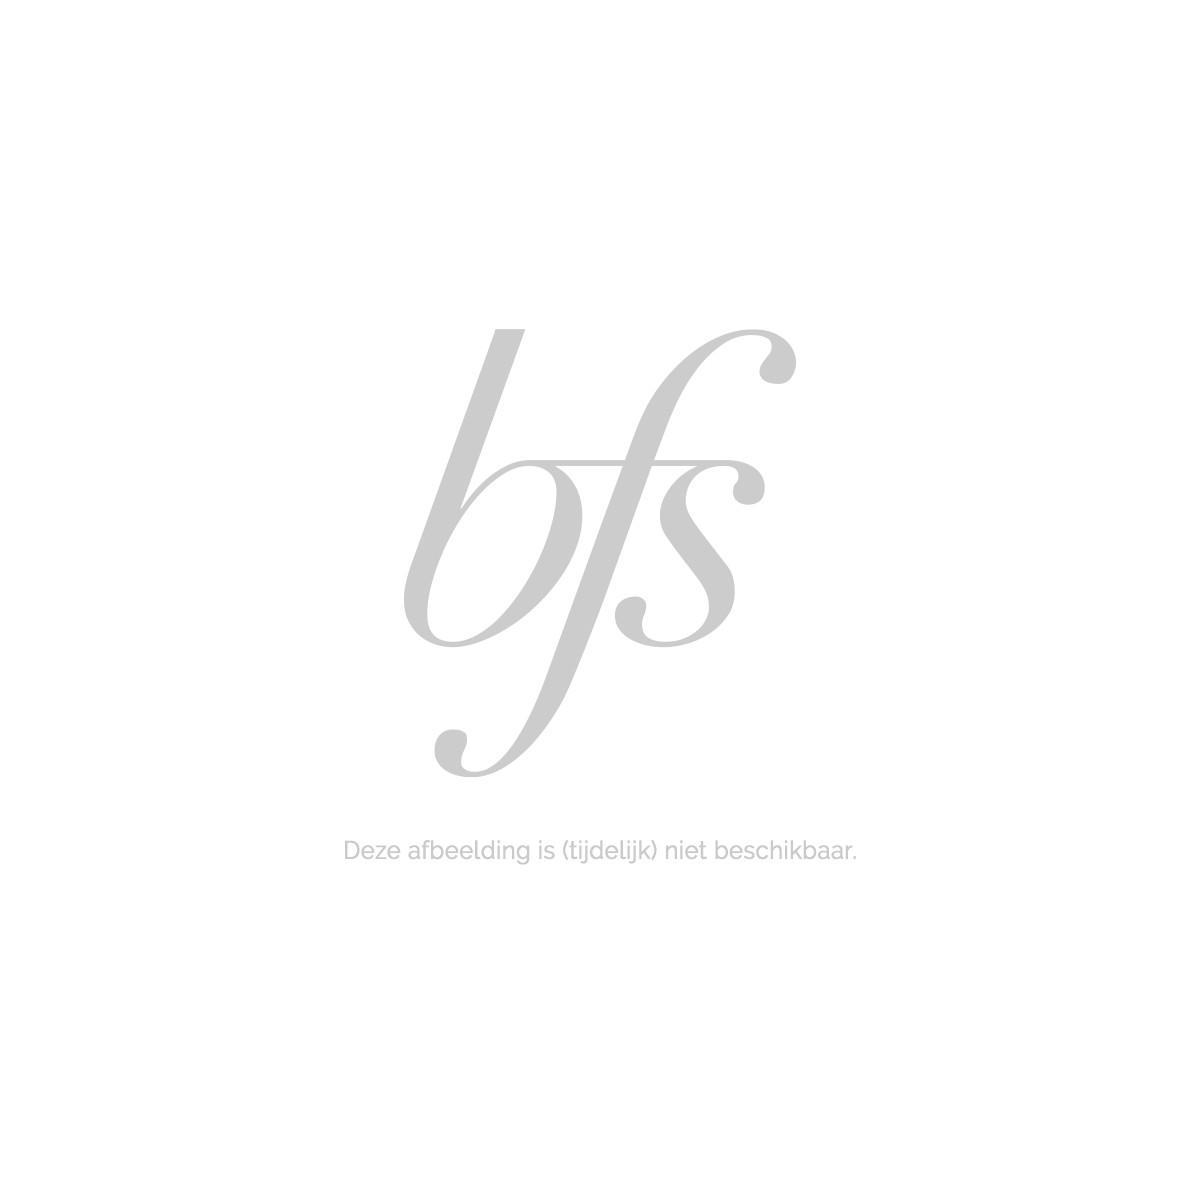 Givenchy Very Irresistible For Women Eau De Toilette Spray 50 Ml